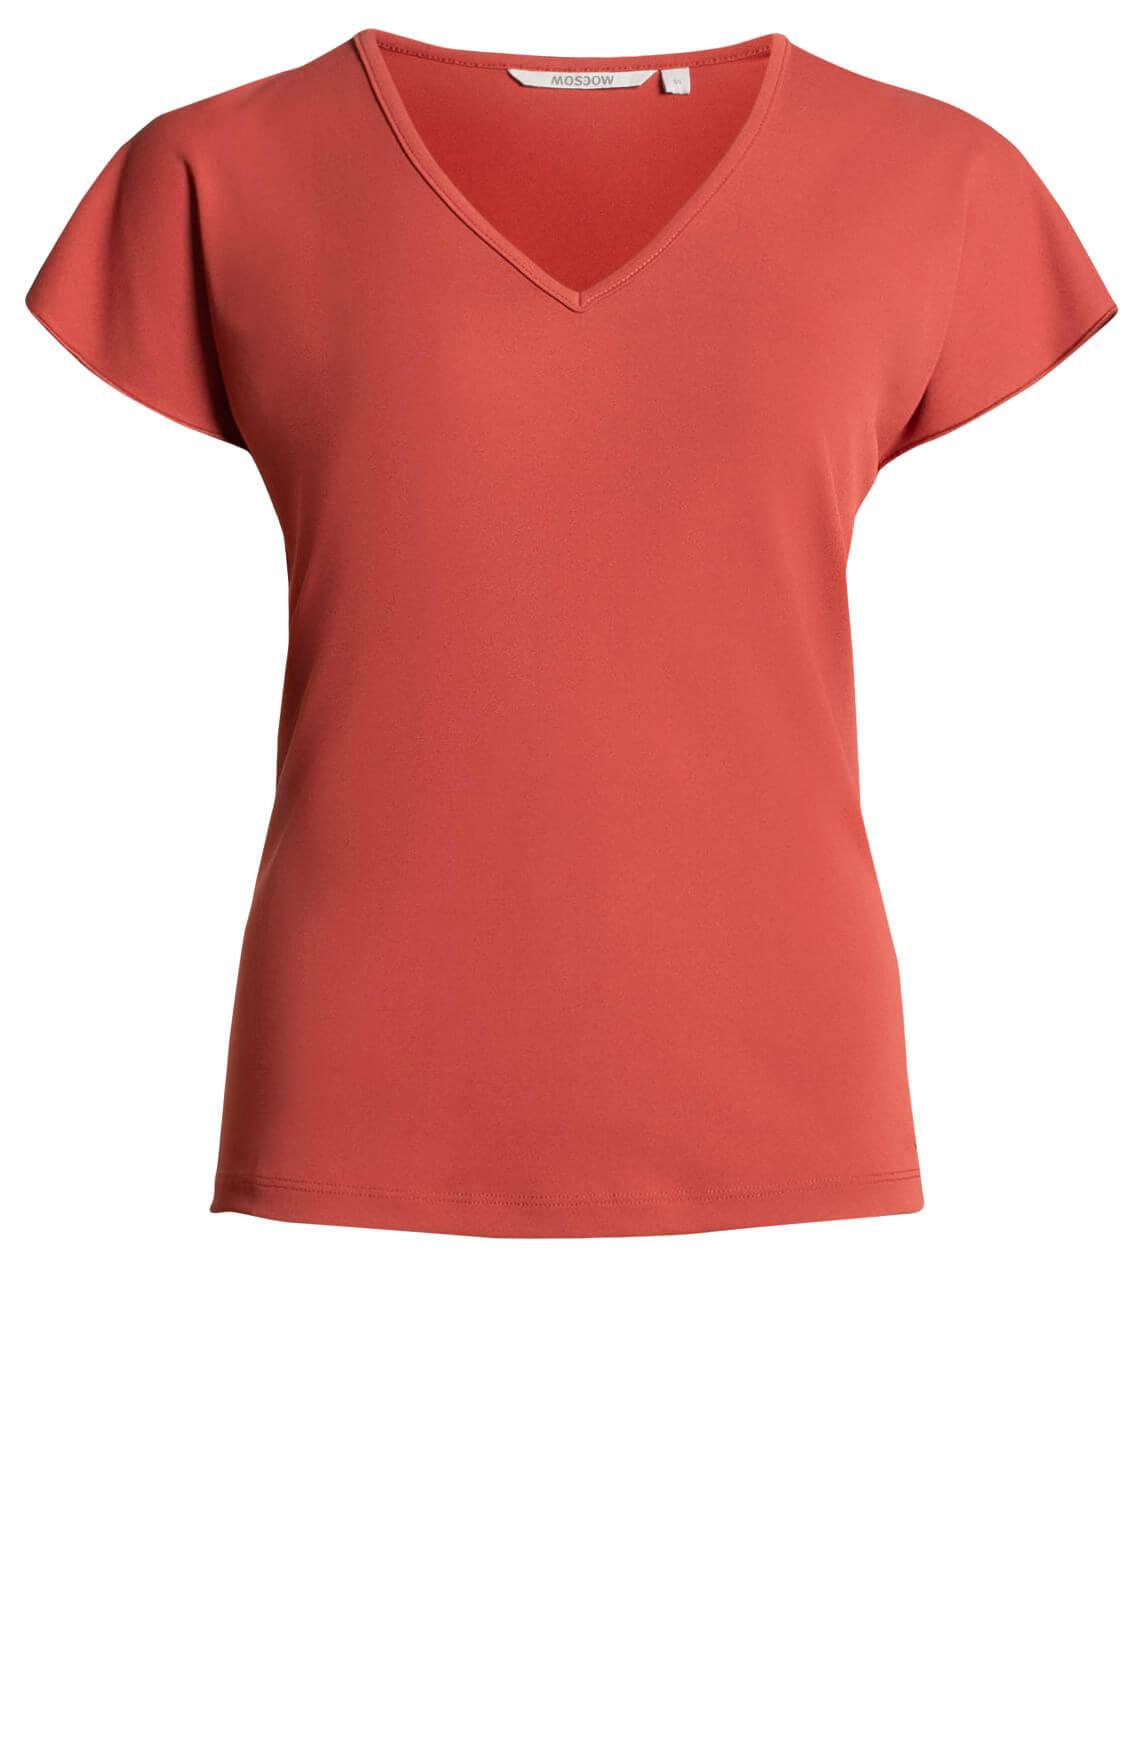 Moscow Dames Shirt met V-hals Rood